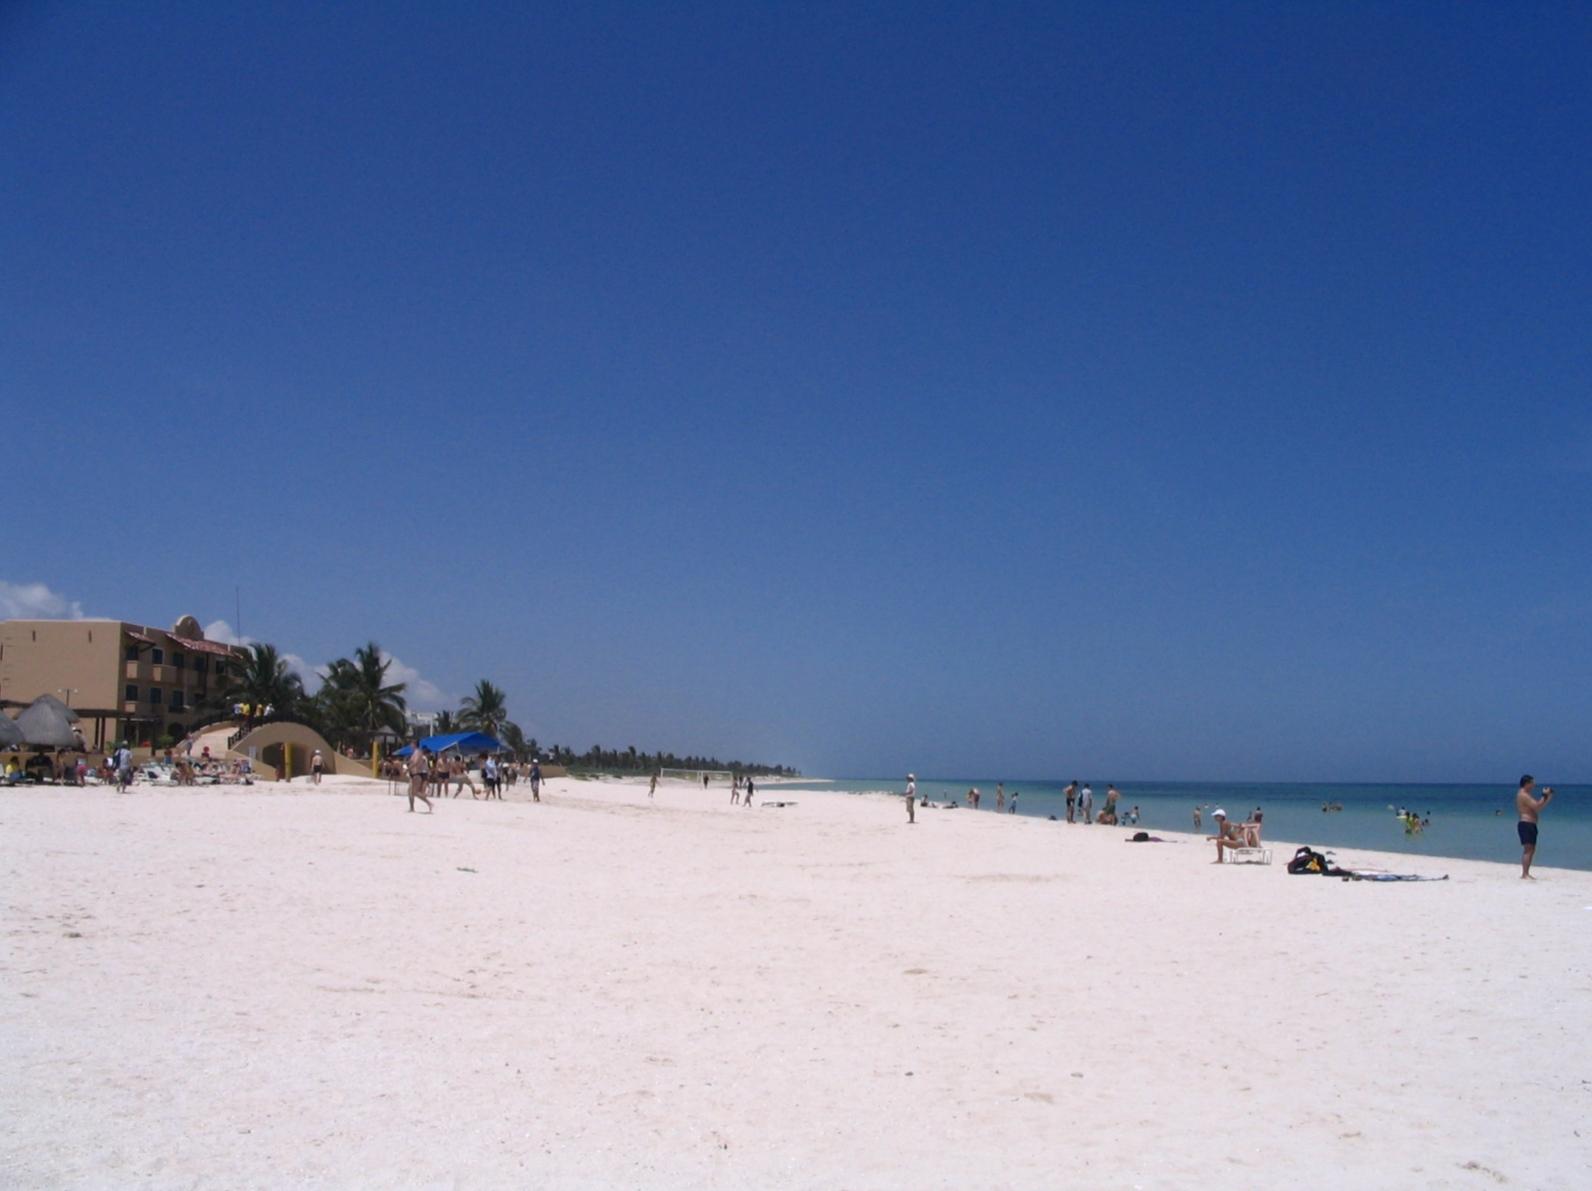 Beach_at_Progreso,_Yucatán.JPG